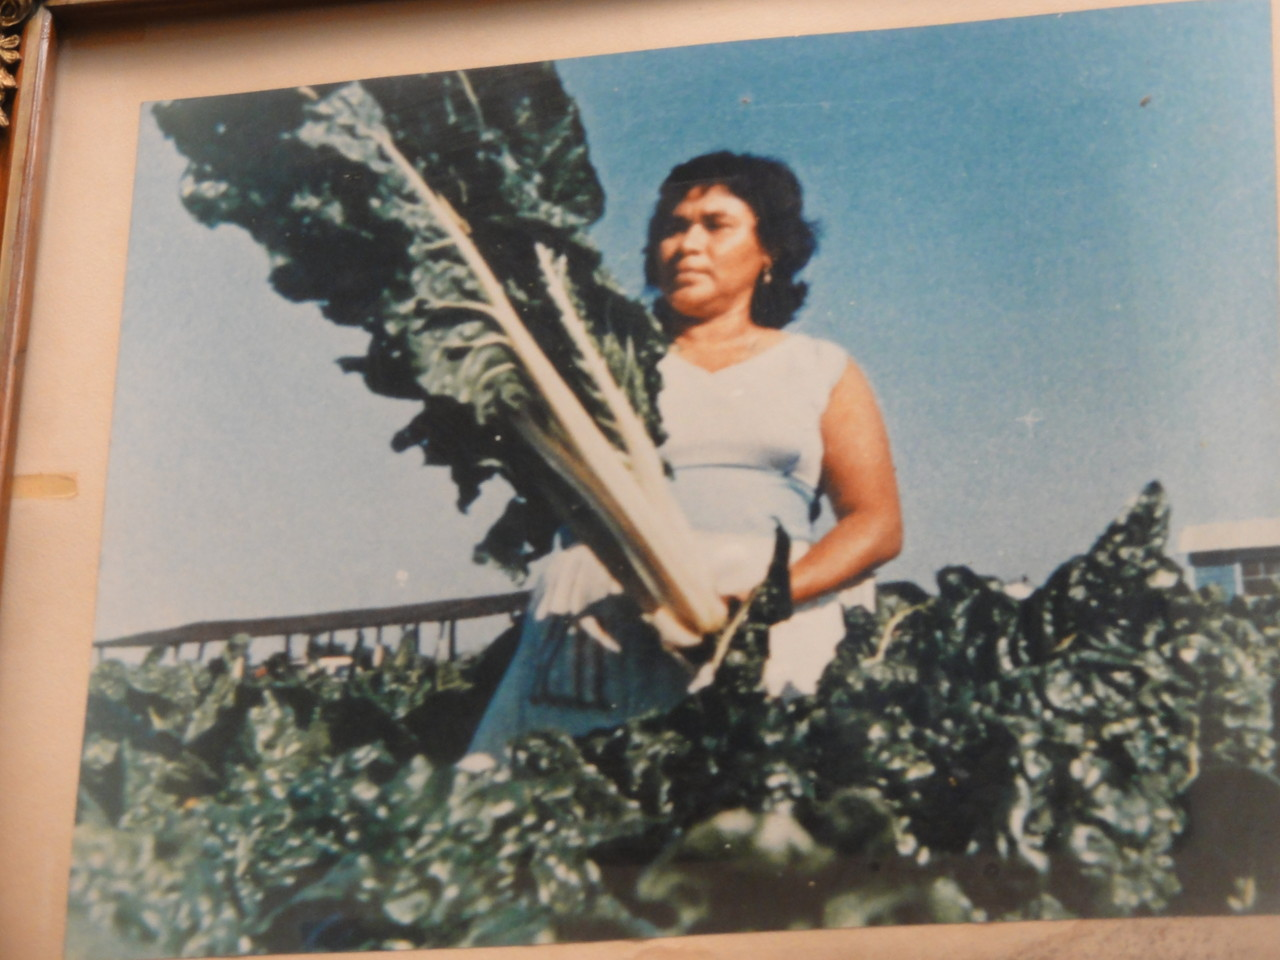 las hortalizas gigantes de ... la Hoya de Álvarez